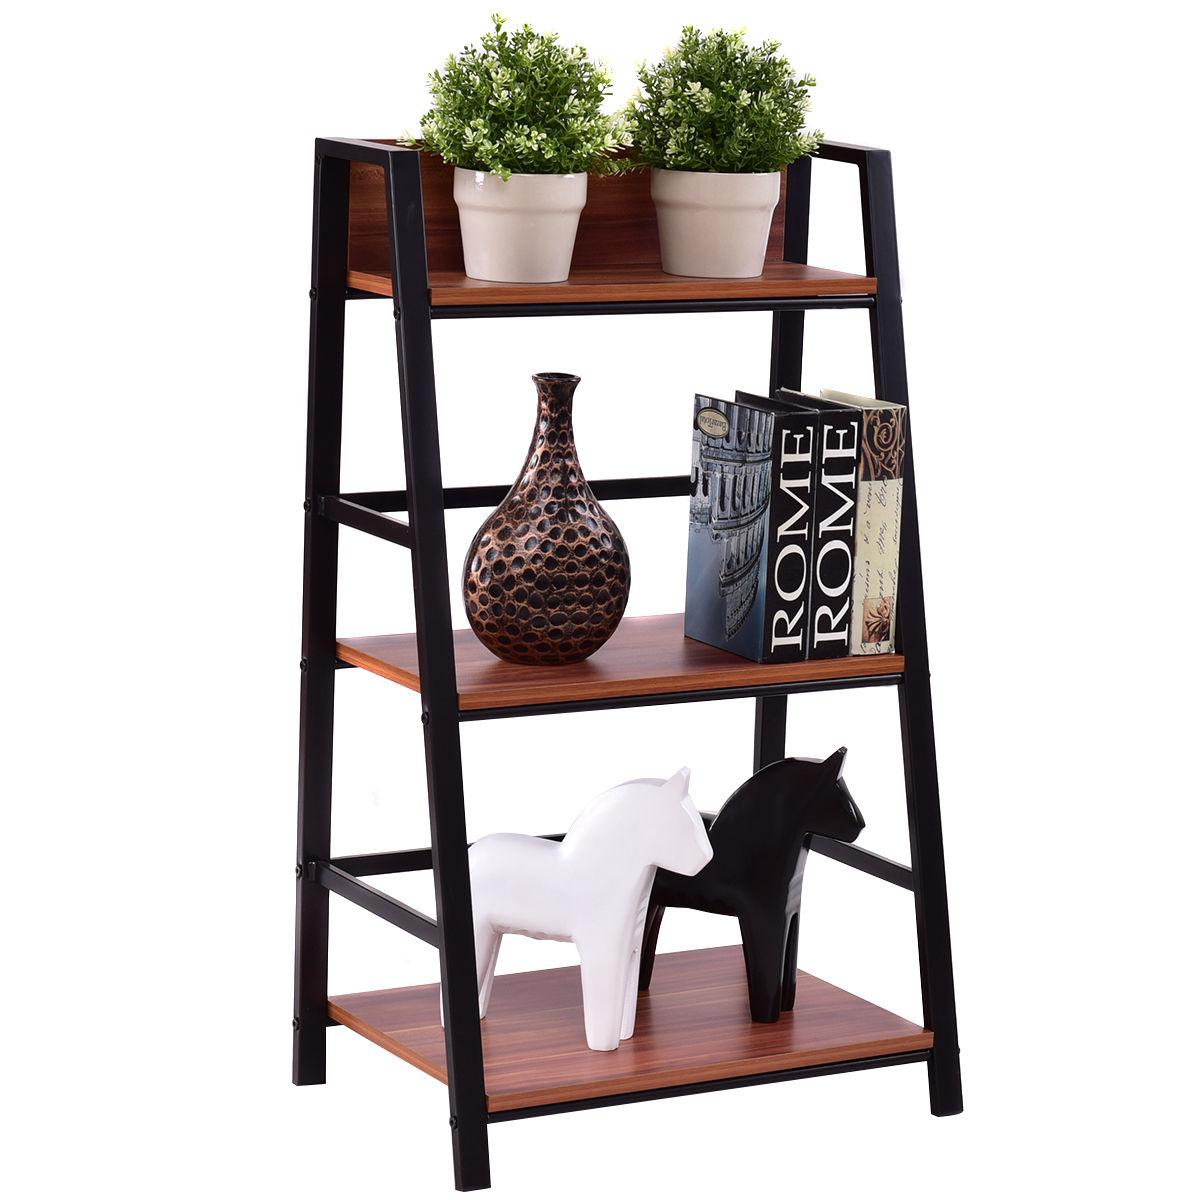 Giantex 3 Tier Ladder Display Shlf Living Room Storage Bookshelf Wooden Wall Bookcase Modern Floor Decor Furniture HW55403